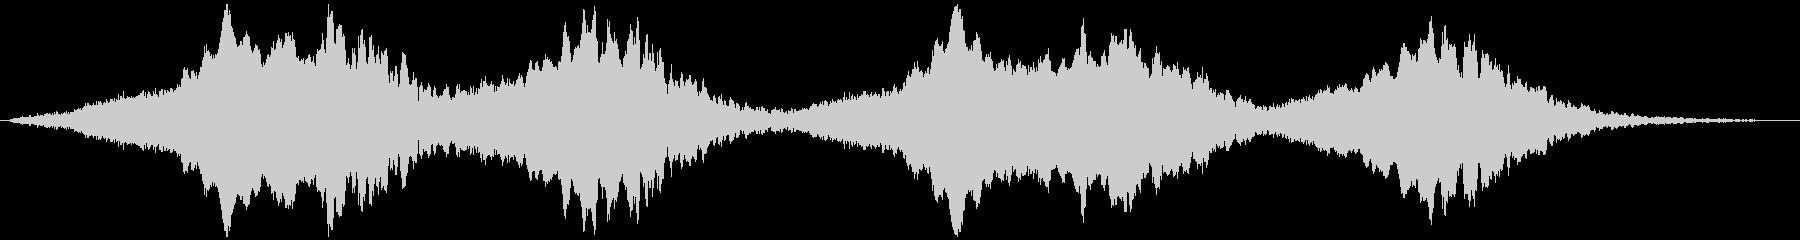 PADS ホエールソング03の未再生の波形